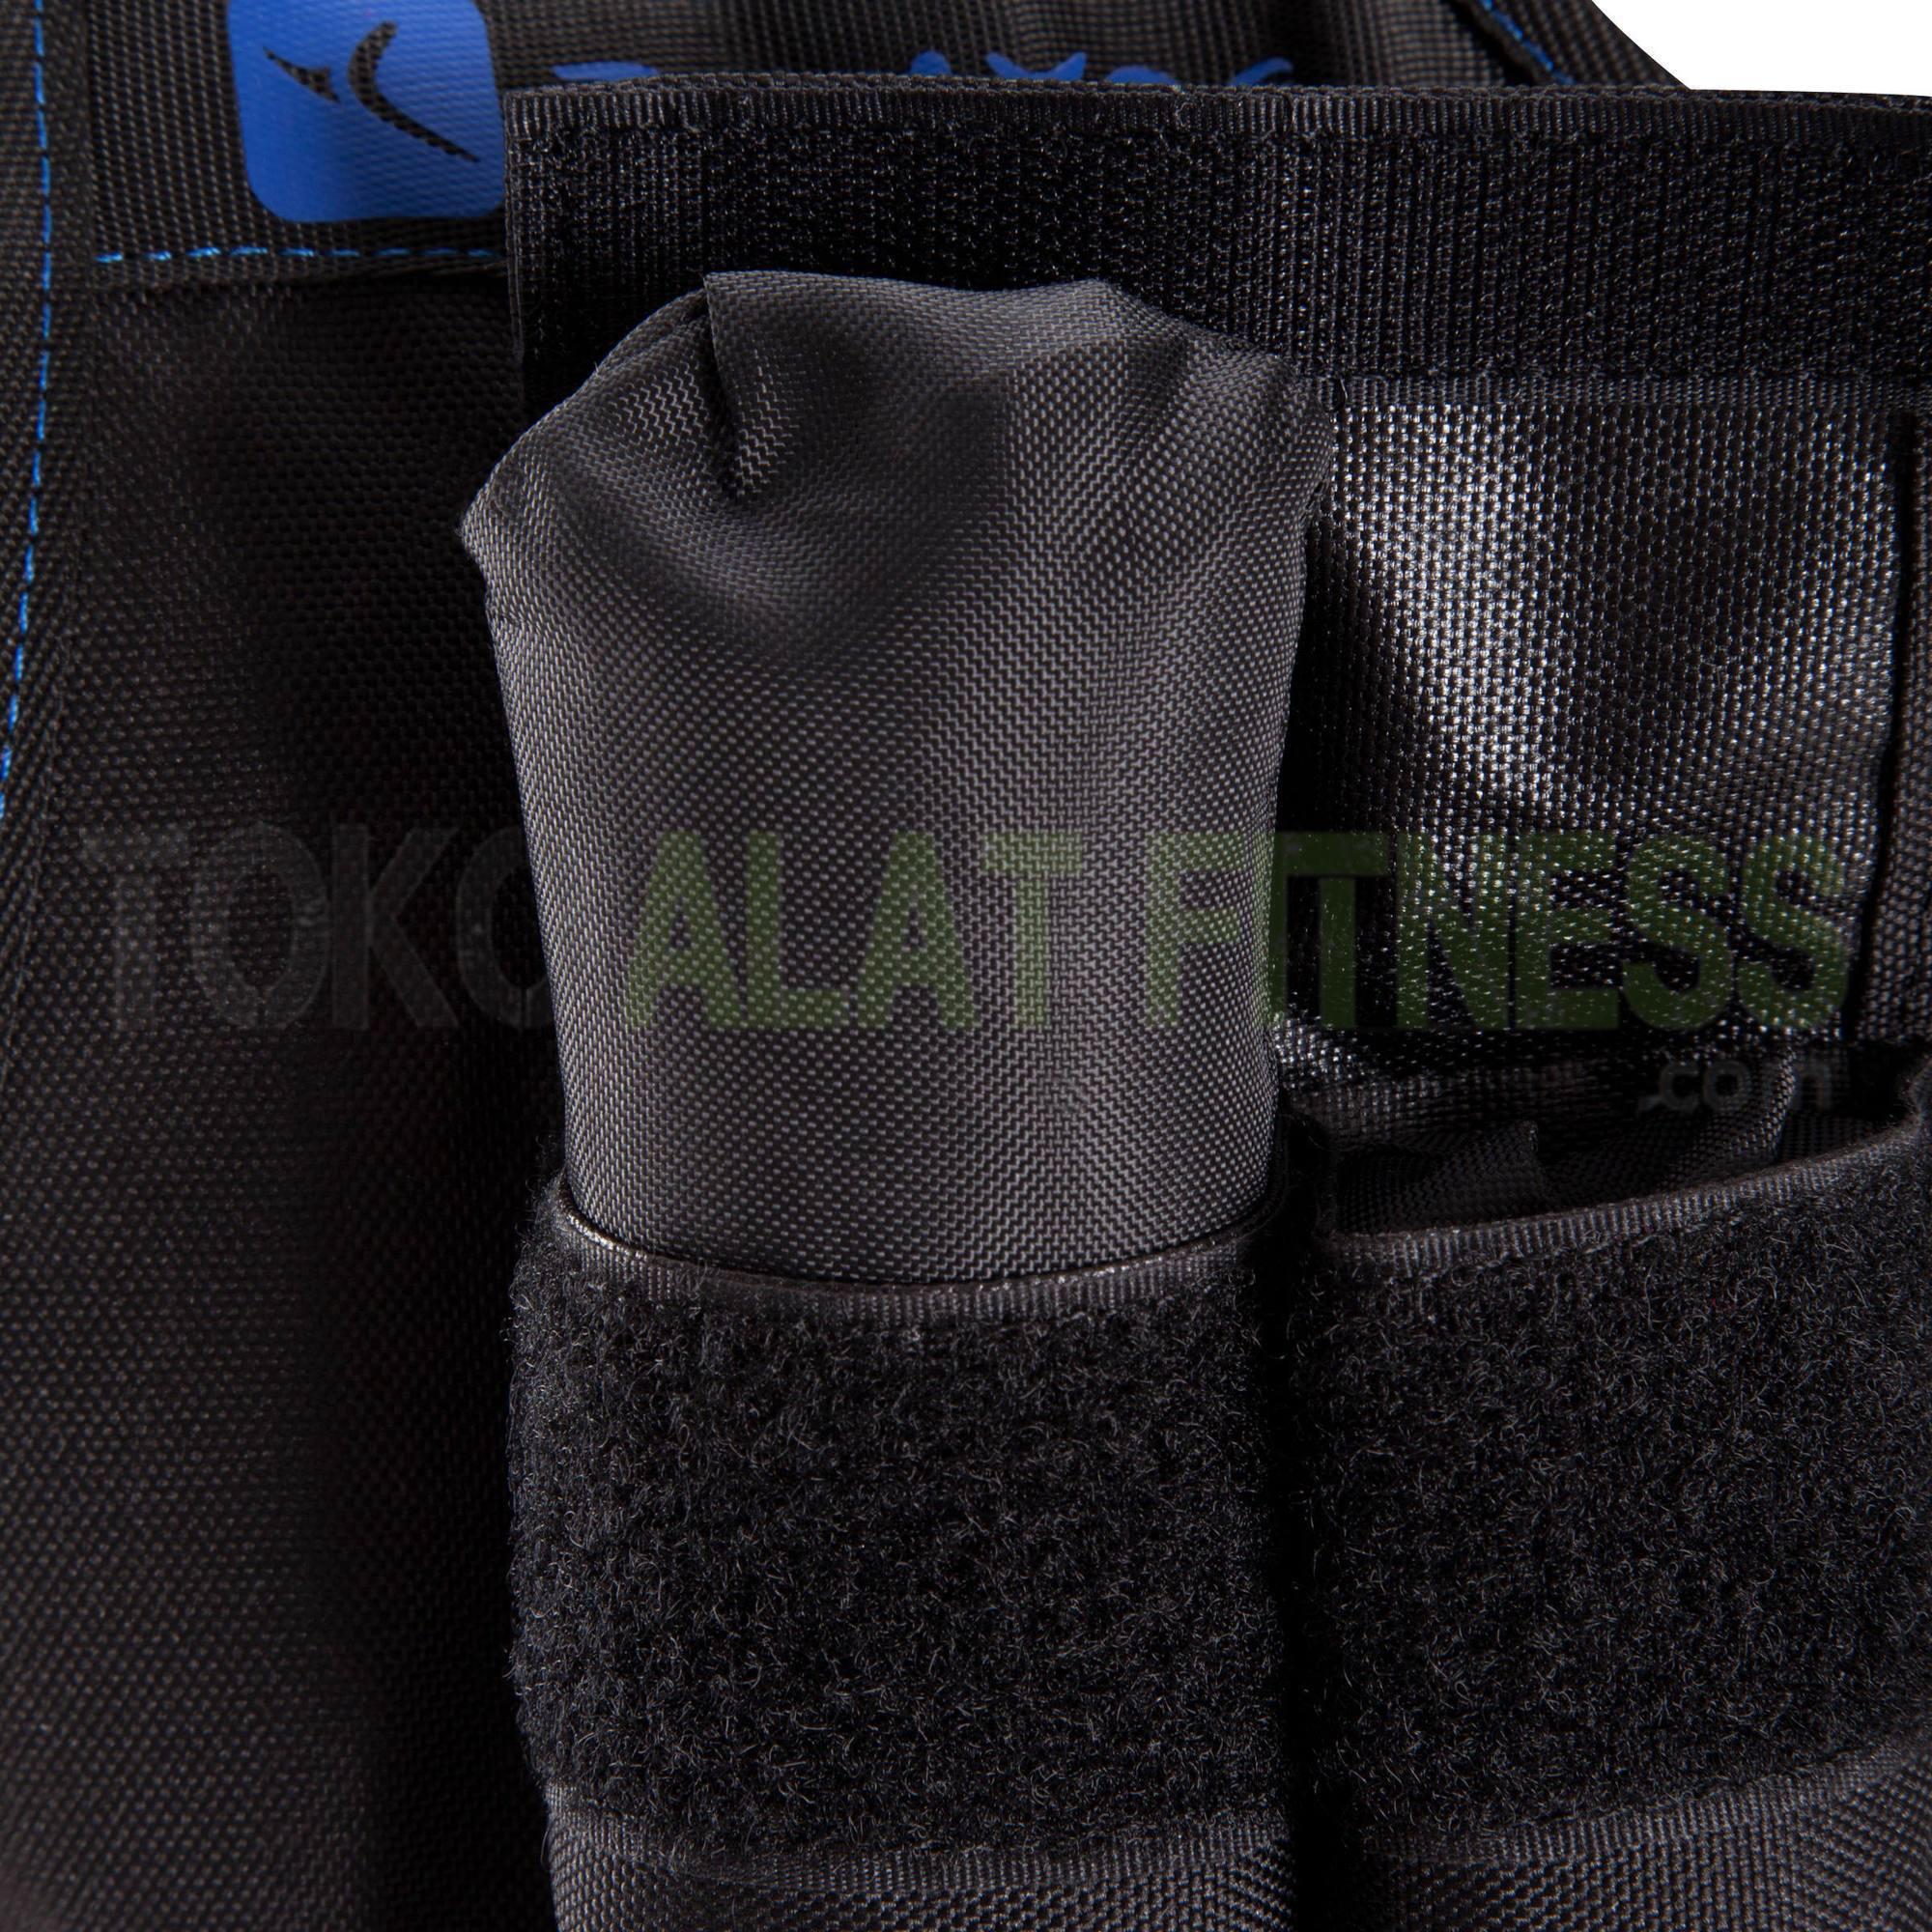 rompi pemberat domyos wtm 4 - Weight Vest/Rompi Pemberat 10kg Domyos - ASSAW39